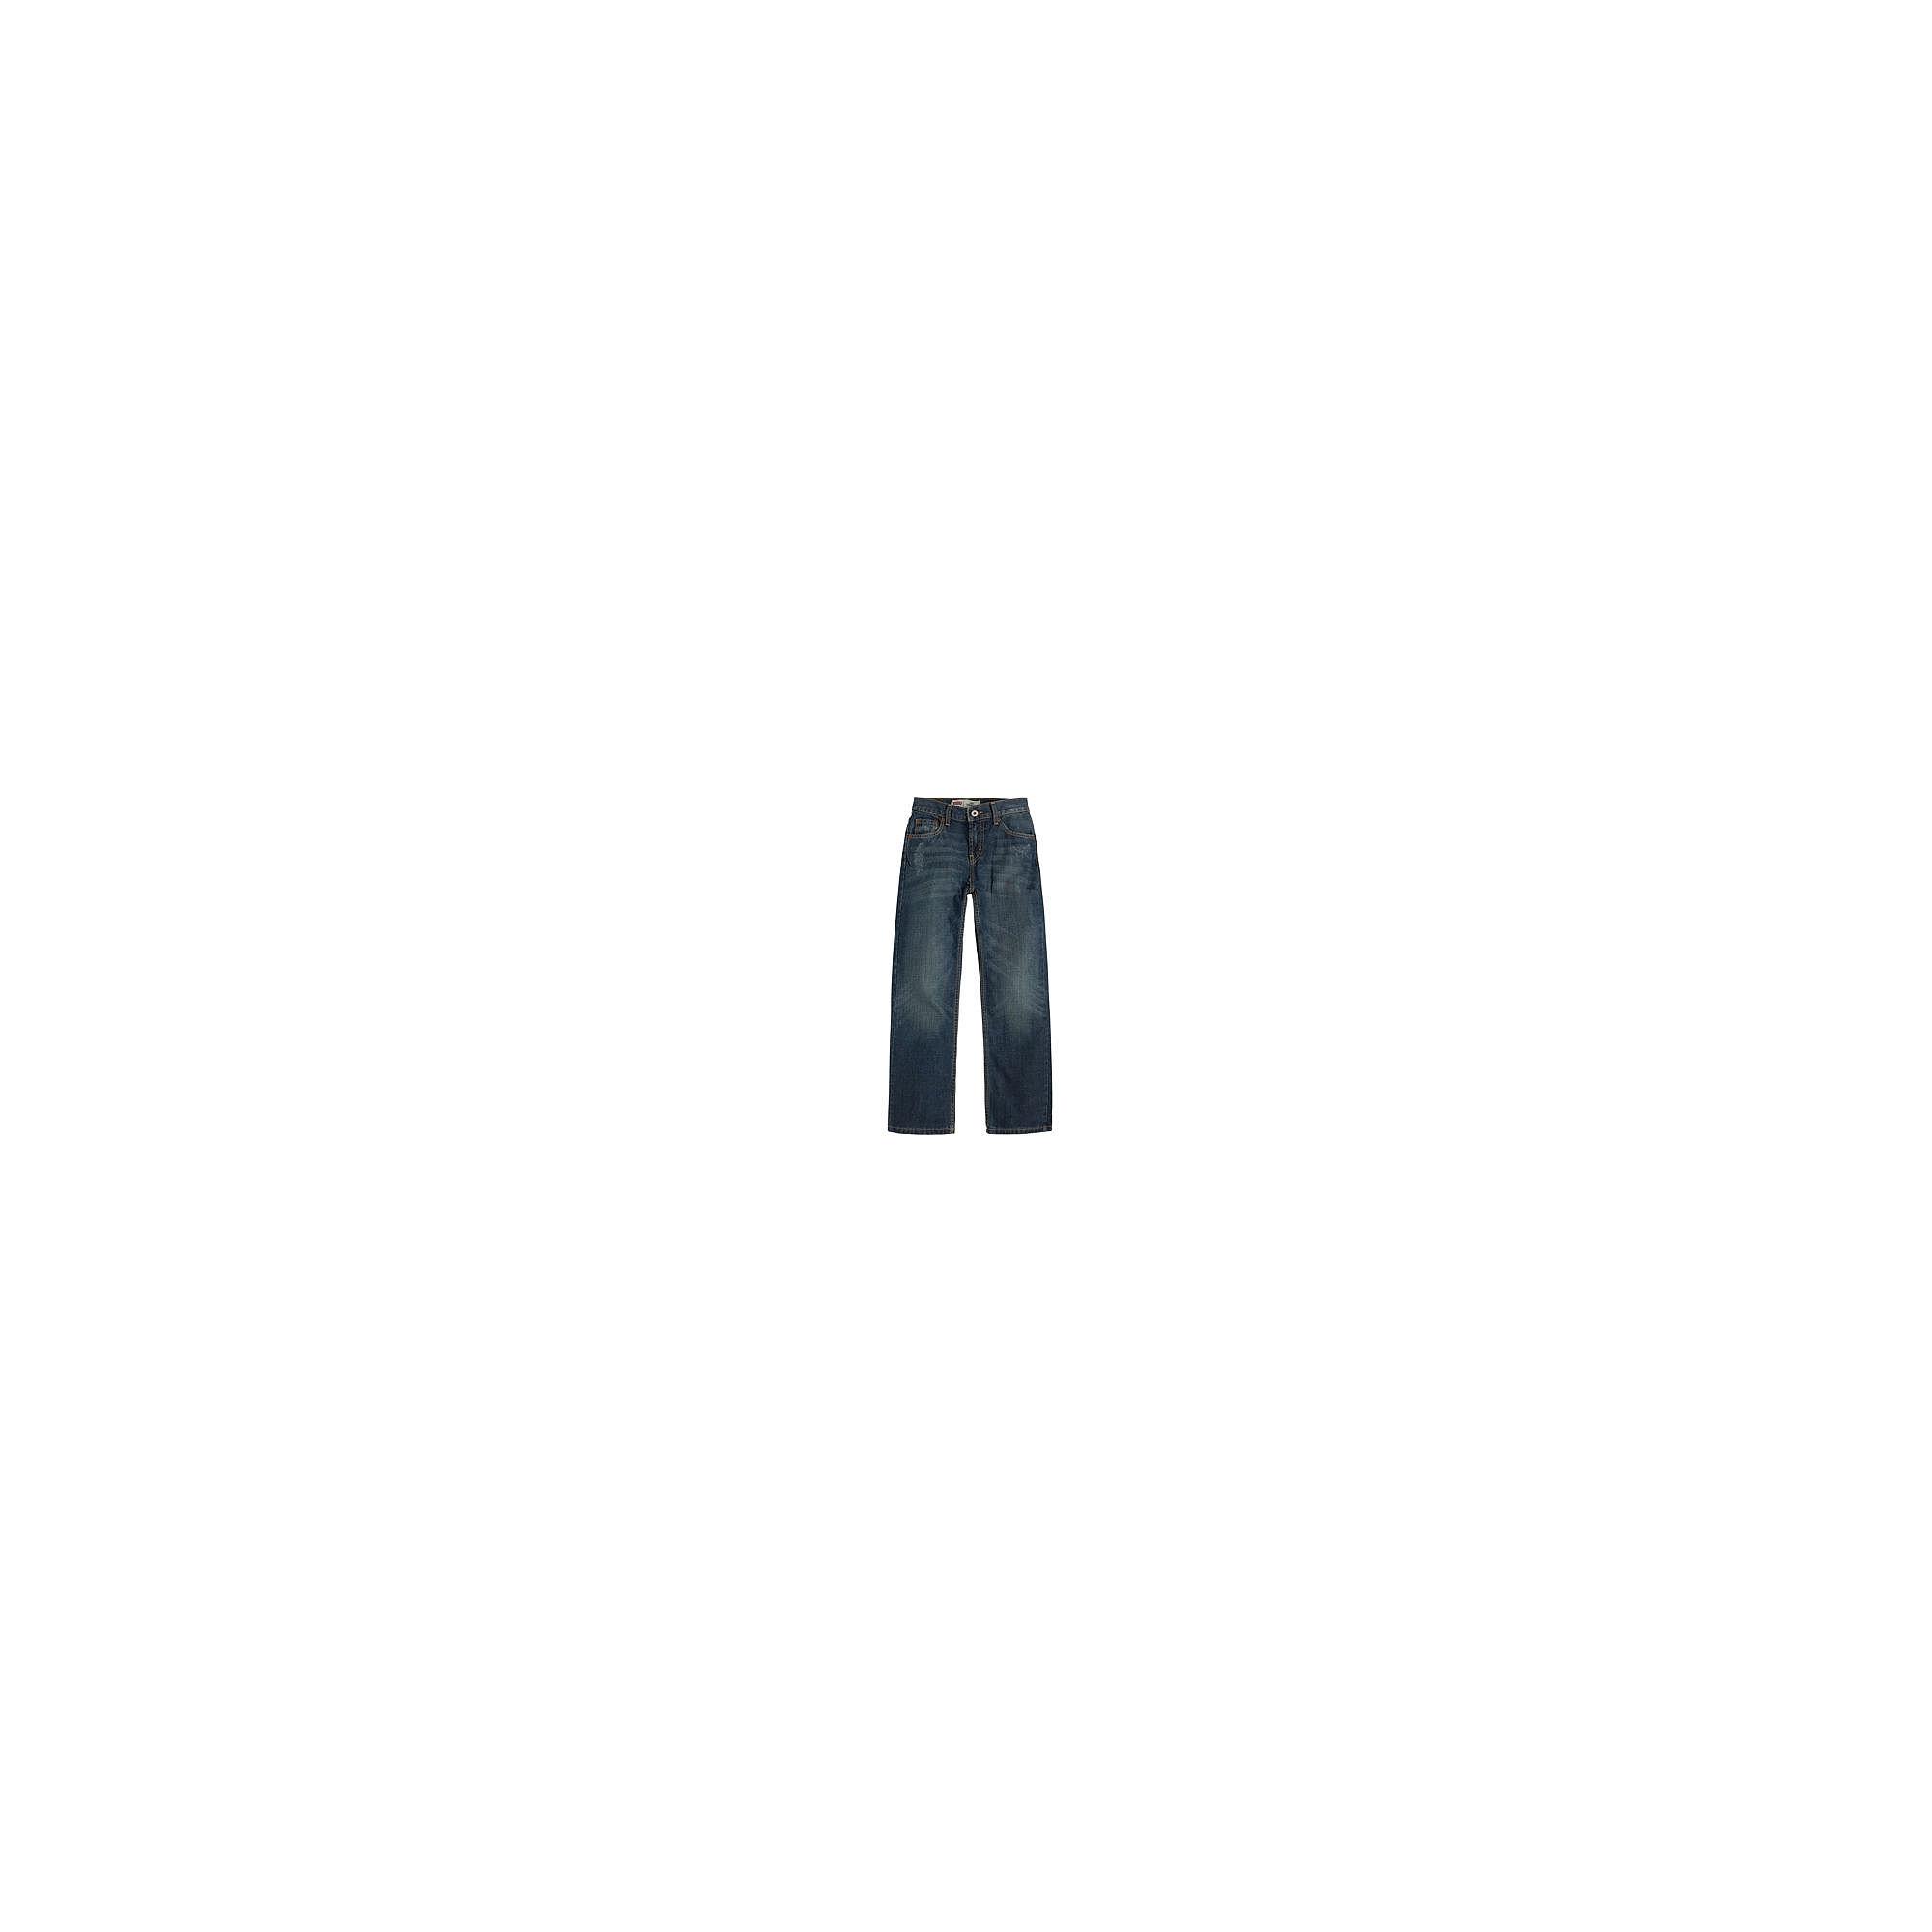 "Levi's 514"" Straight-Fit Jeans - Boys 8-18  Slim and Husky"